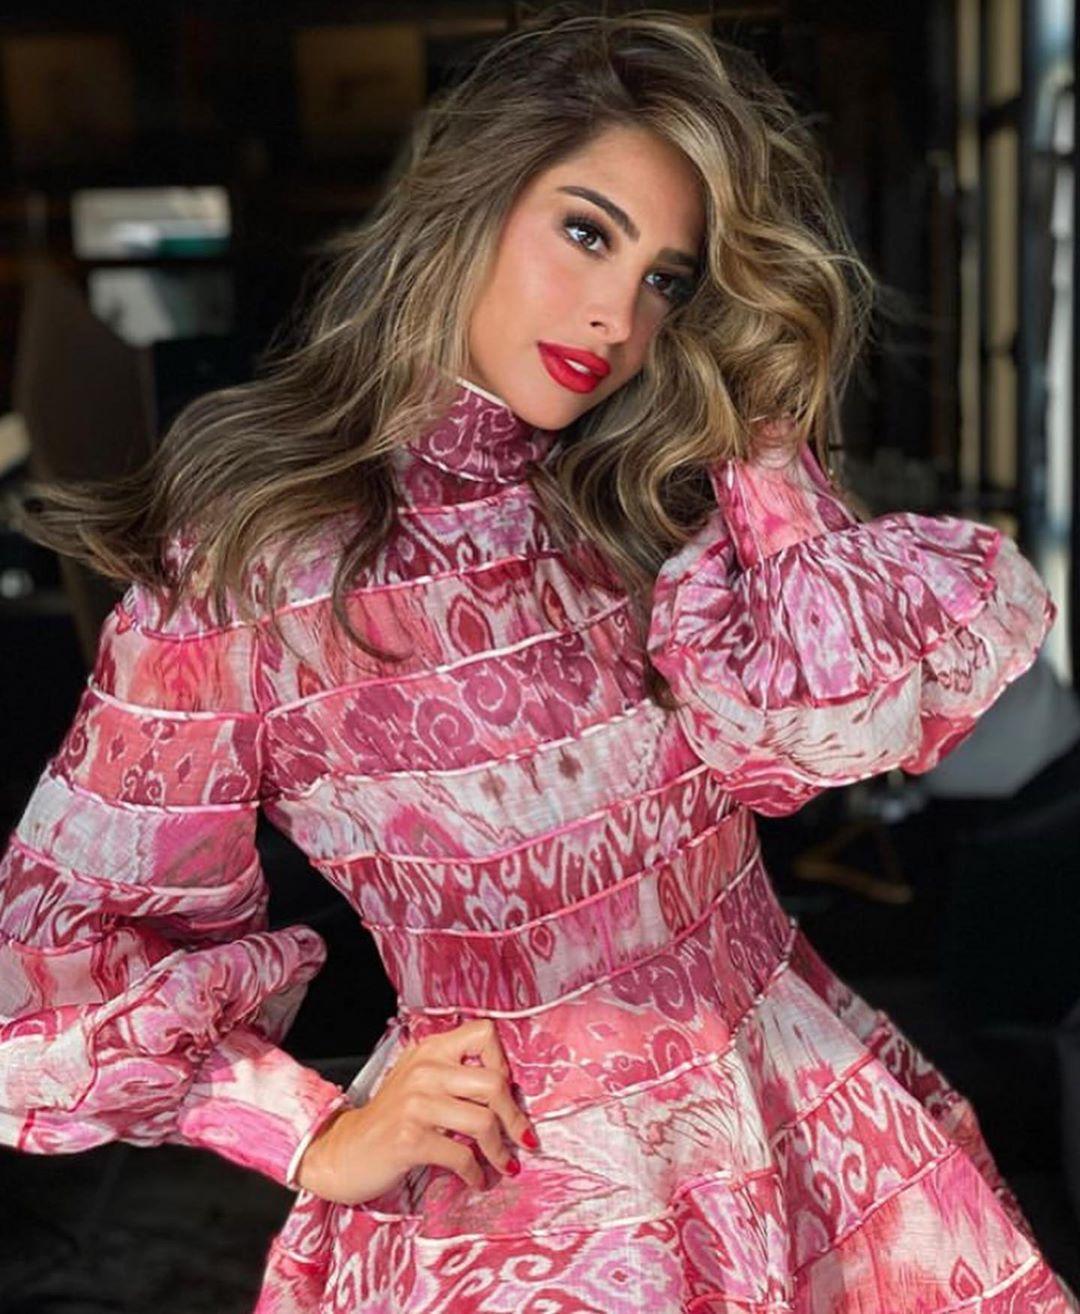 𖤐𝗕𝗲𝗮𝘂𝘁𝘆 𝘄𝗼𝗿𝗹𝗱𖤐 On Instagram فوز الفهد زايده حلاوتها Fashion Elegant Attire Fashion Beauty